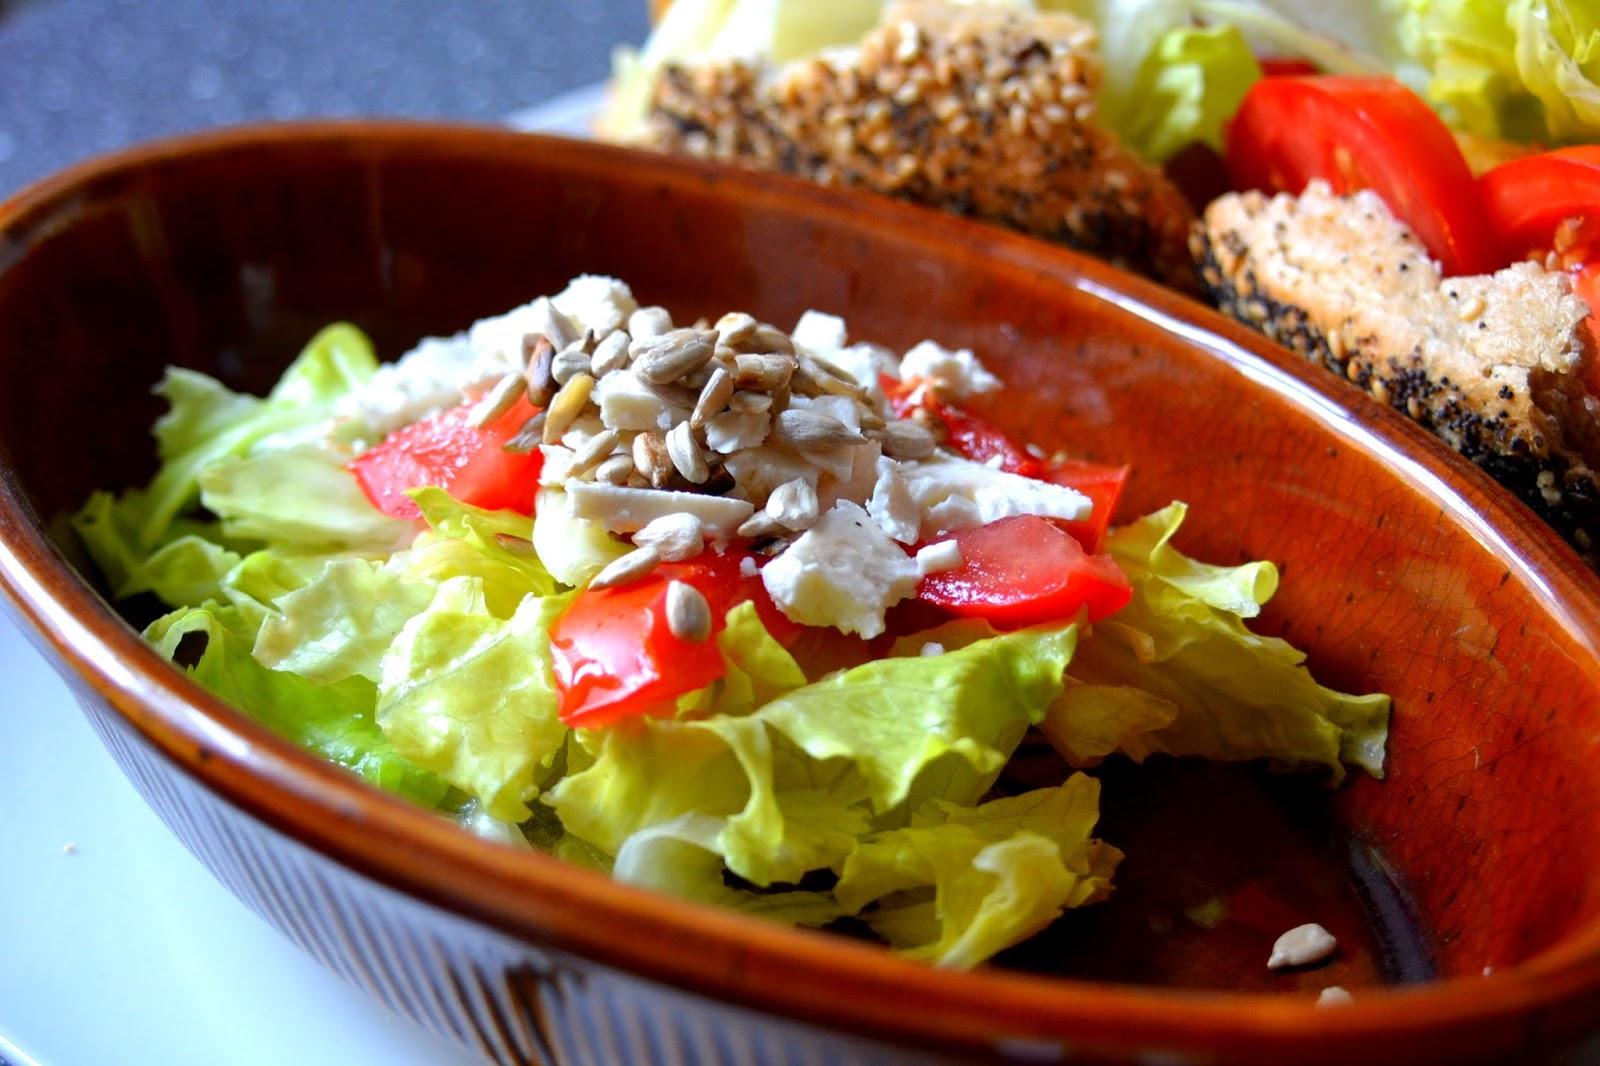 salat schafskäse lecker menü mittag